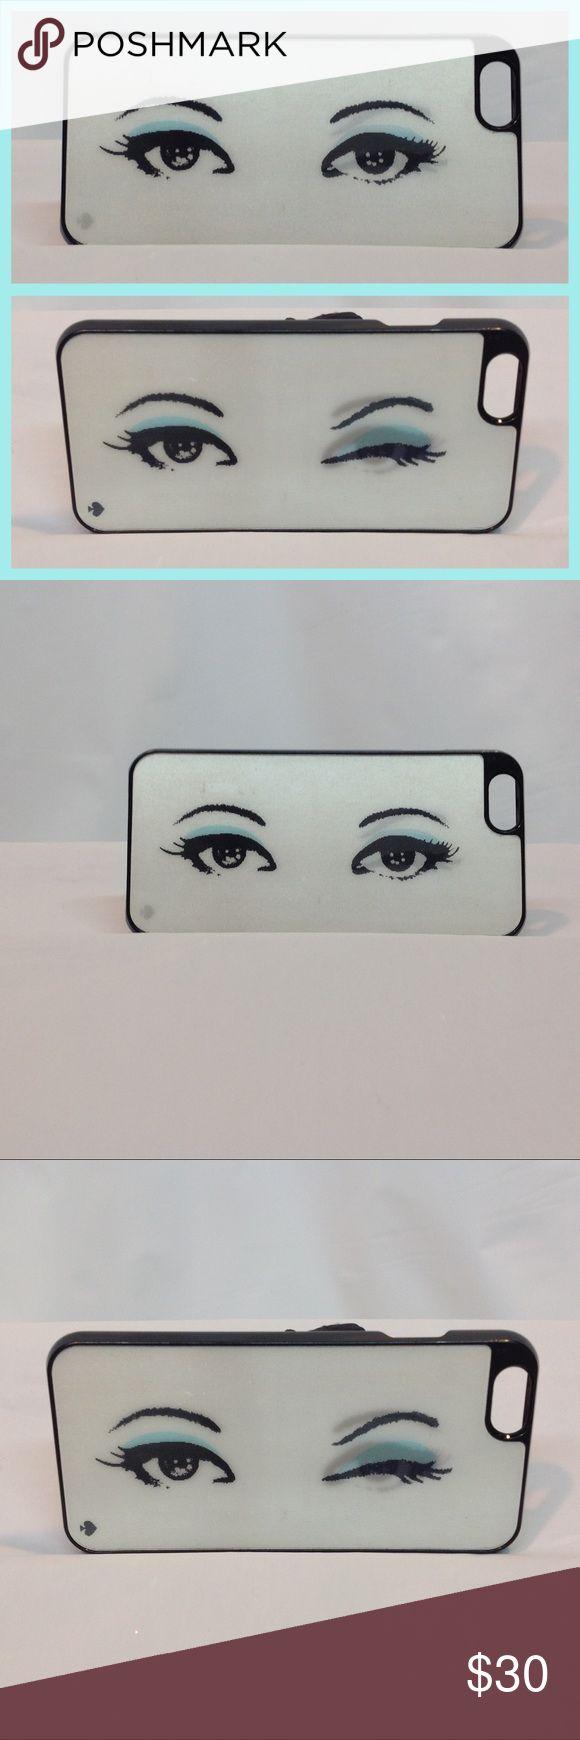 25% off BUNDLESKate Spade hologram phone case Winking eyes hologram iPhone 6/6s case kate spade Accessories Phone Cases